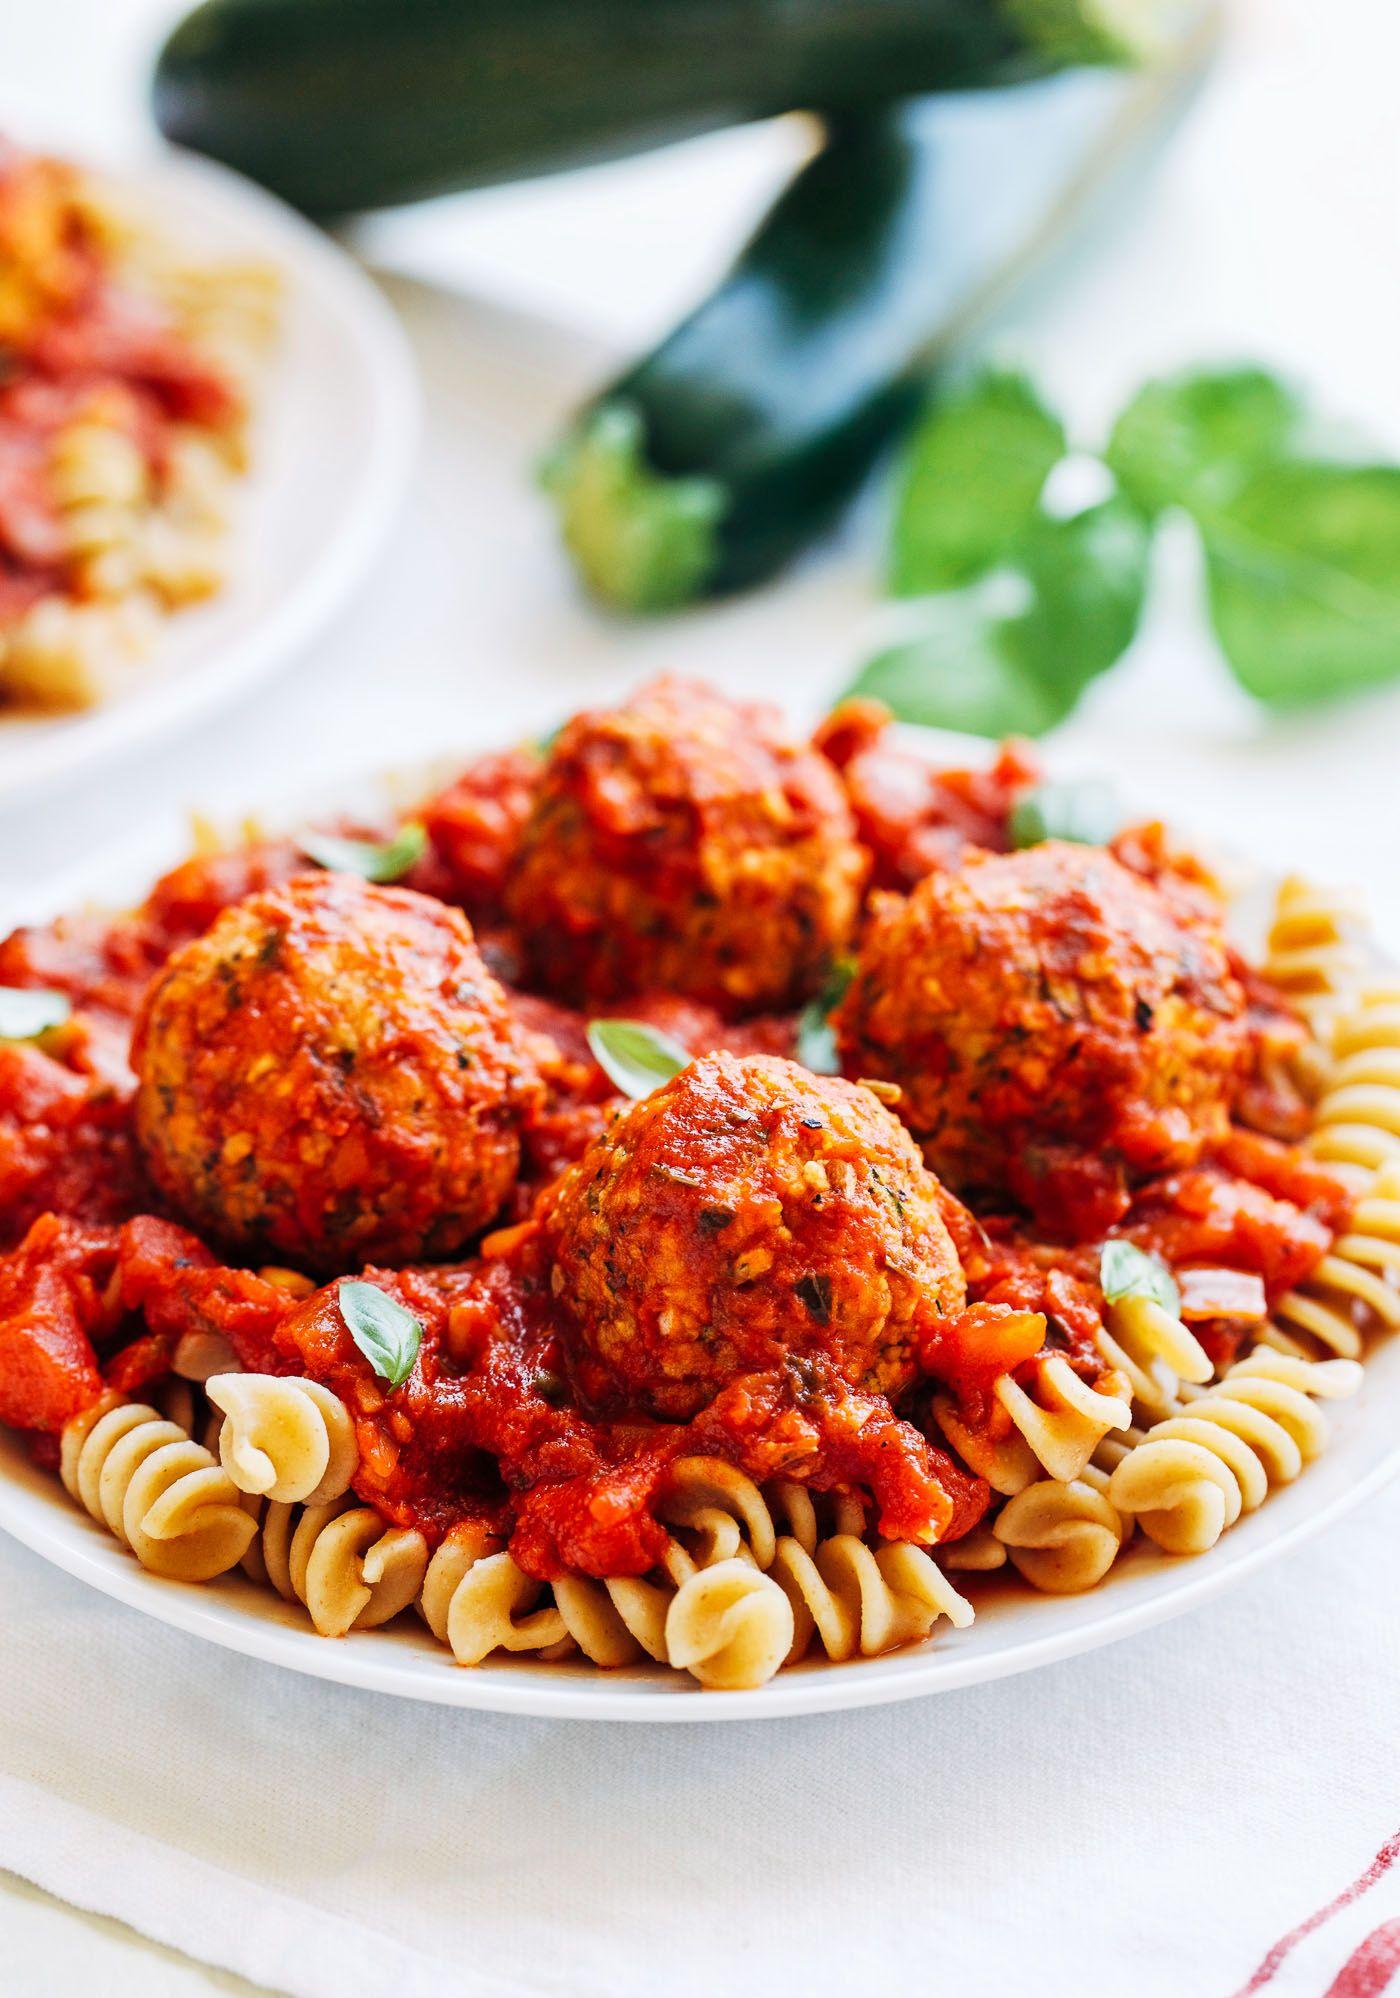 Vegan Zucchini Meatballs